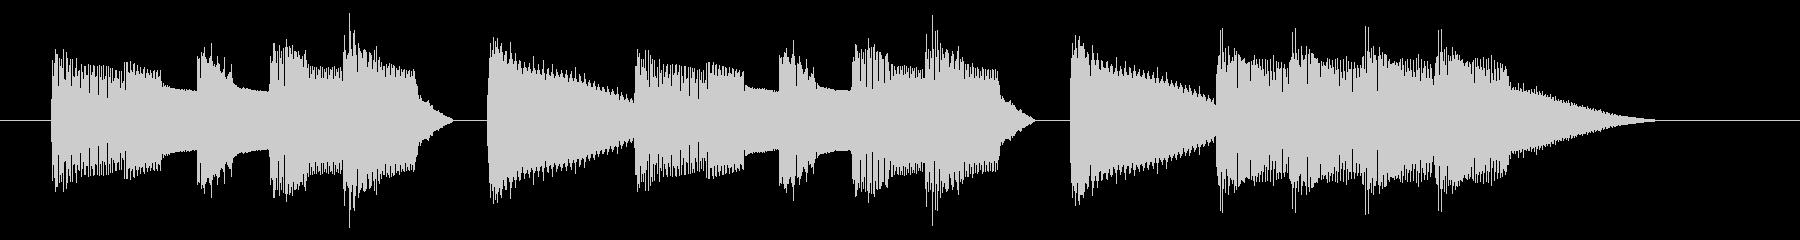 NES アクションA02-1(スタート)の未再生の波形